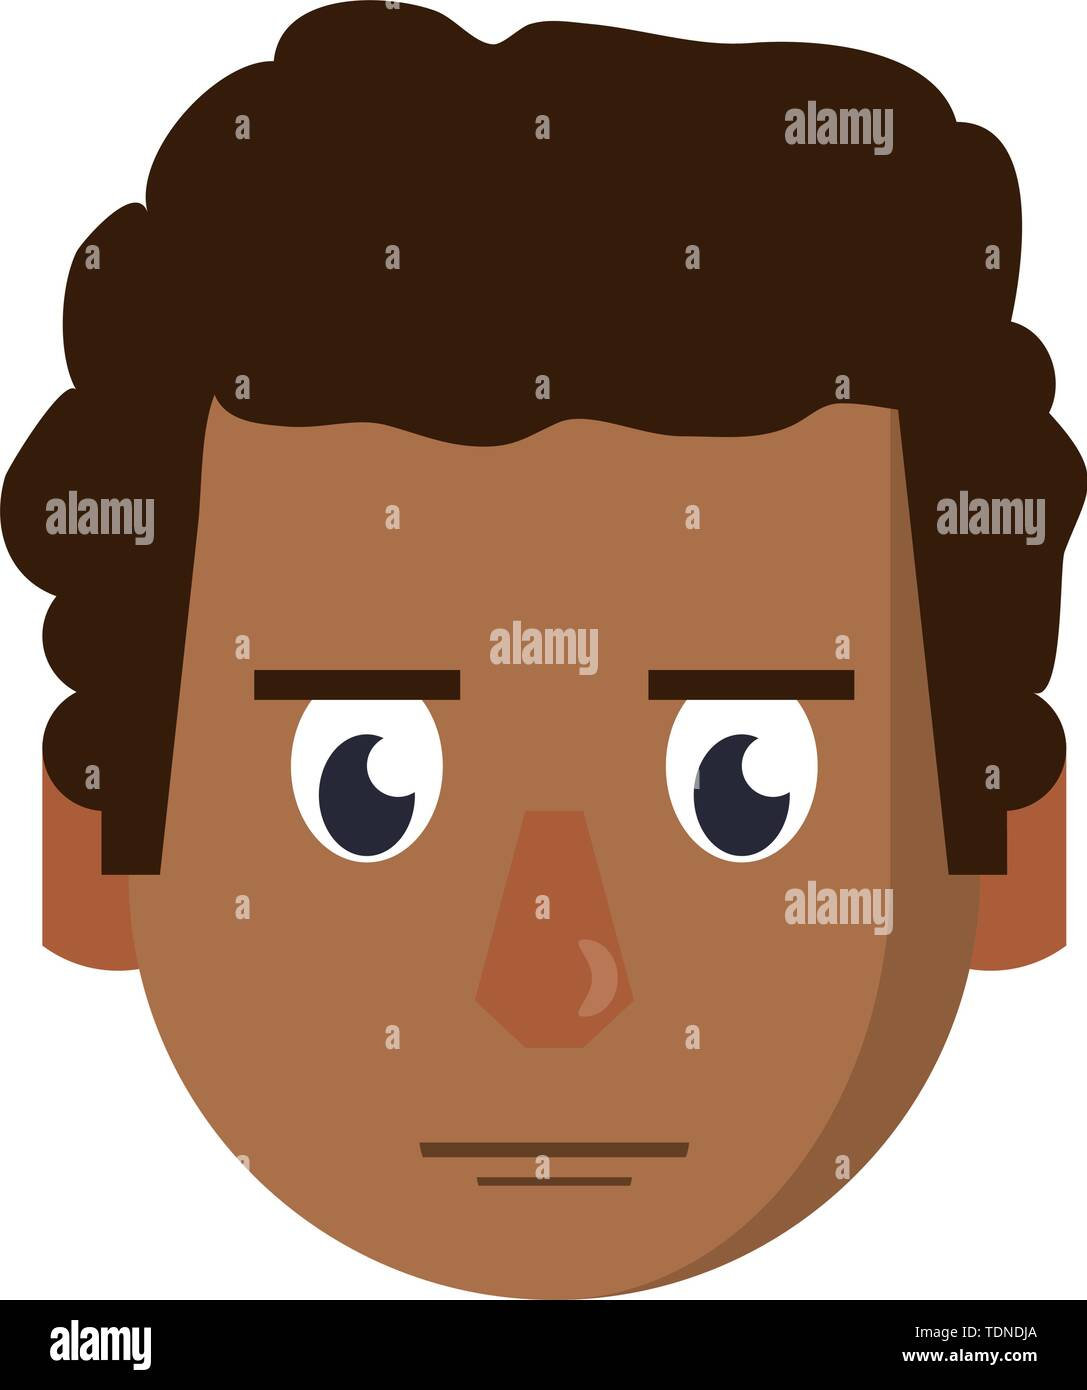 Mann wütend das Gesicht Kopf Charakter cartoon Vector Illustration graphic design Stockbild